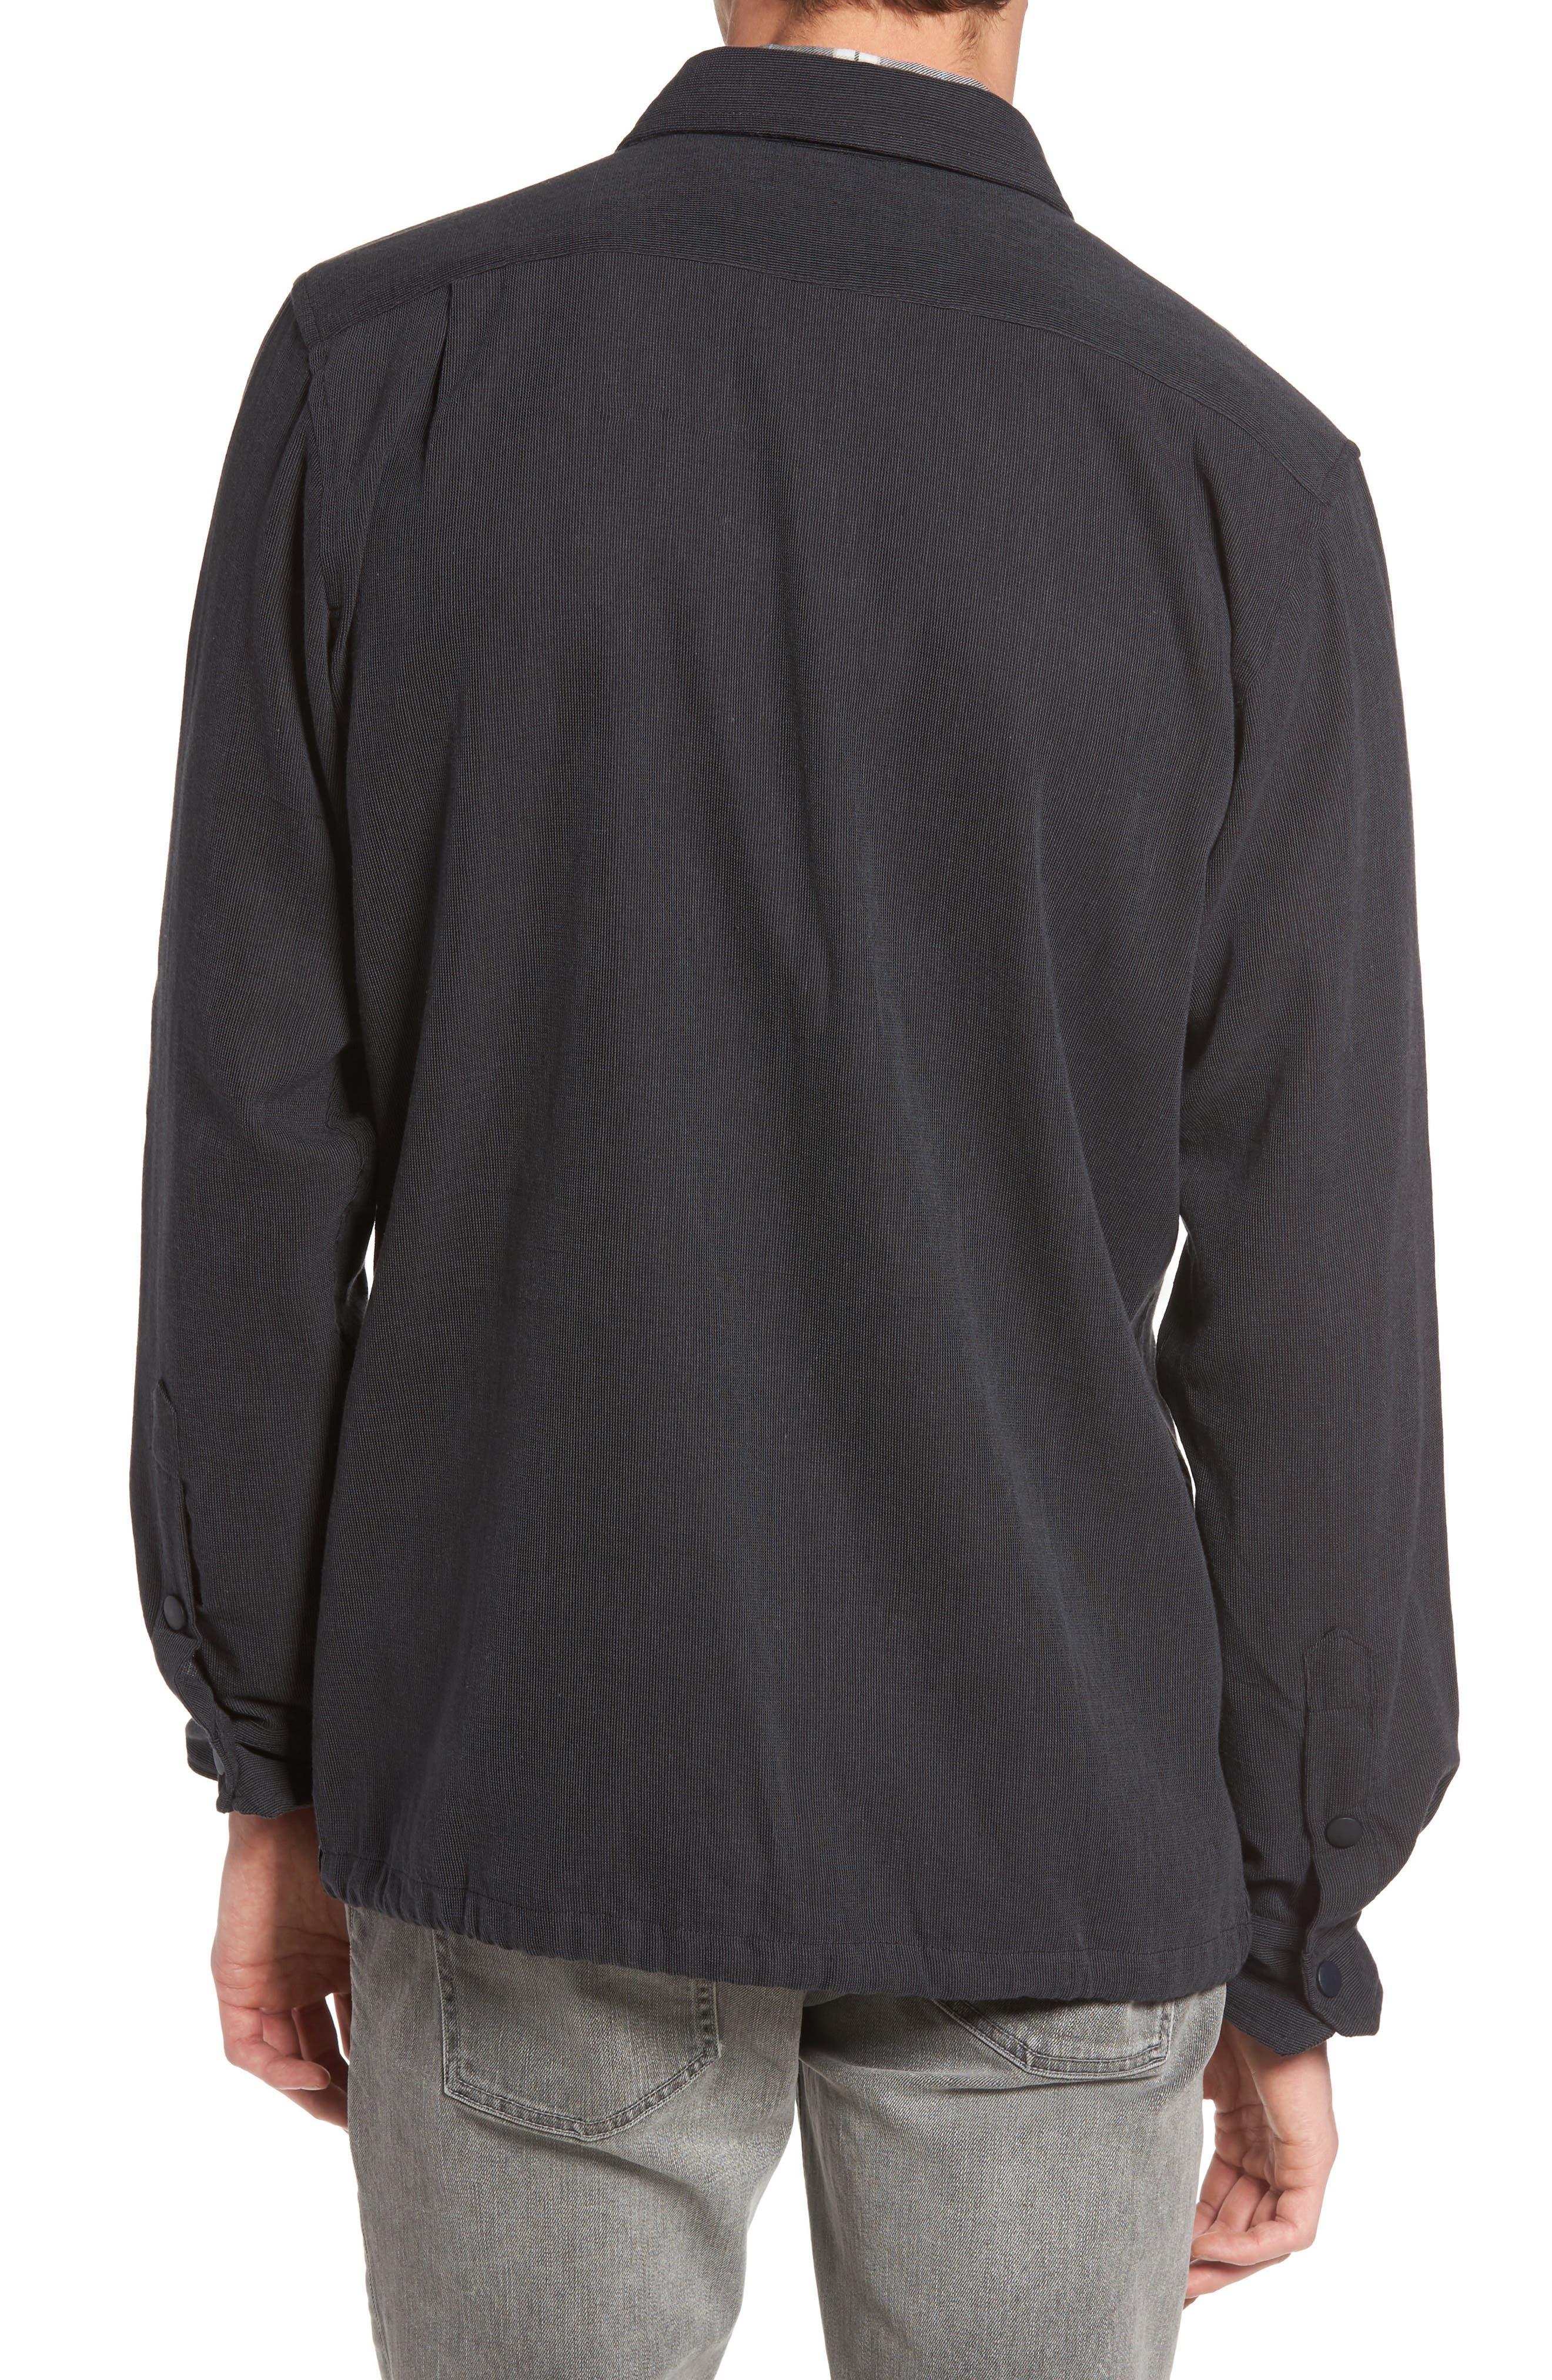 Alternate Image 2  - Ezekiel Textured Cotton Coach's Jacket